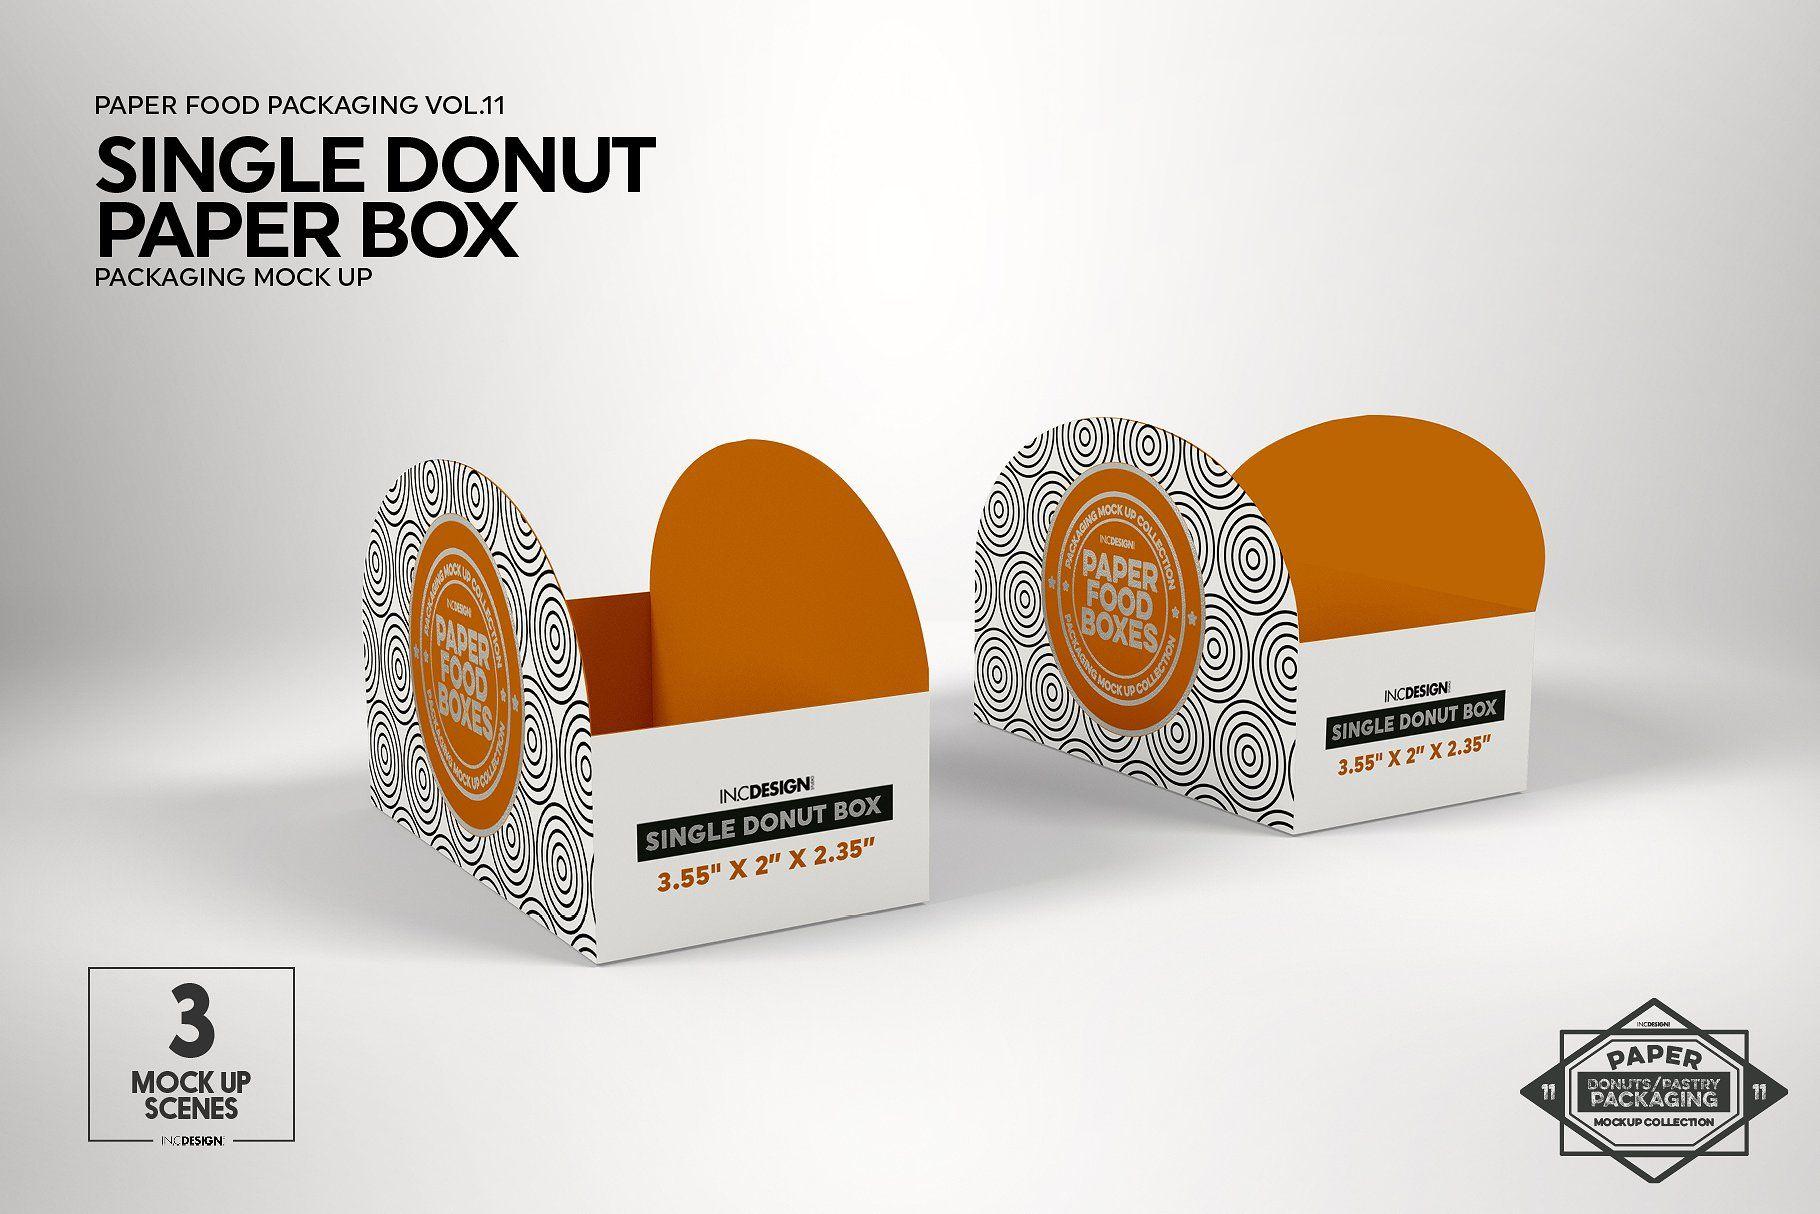 Download Vol 11 Food Box Packaging Mockups Food Box Packaging Packaging Mockup Recipe Box